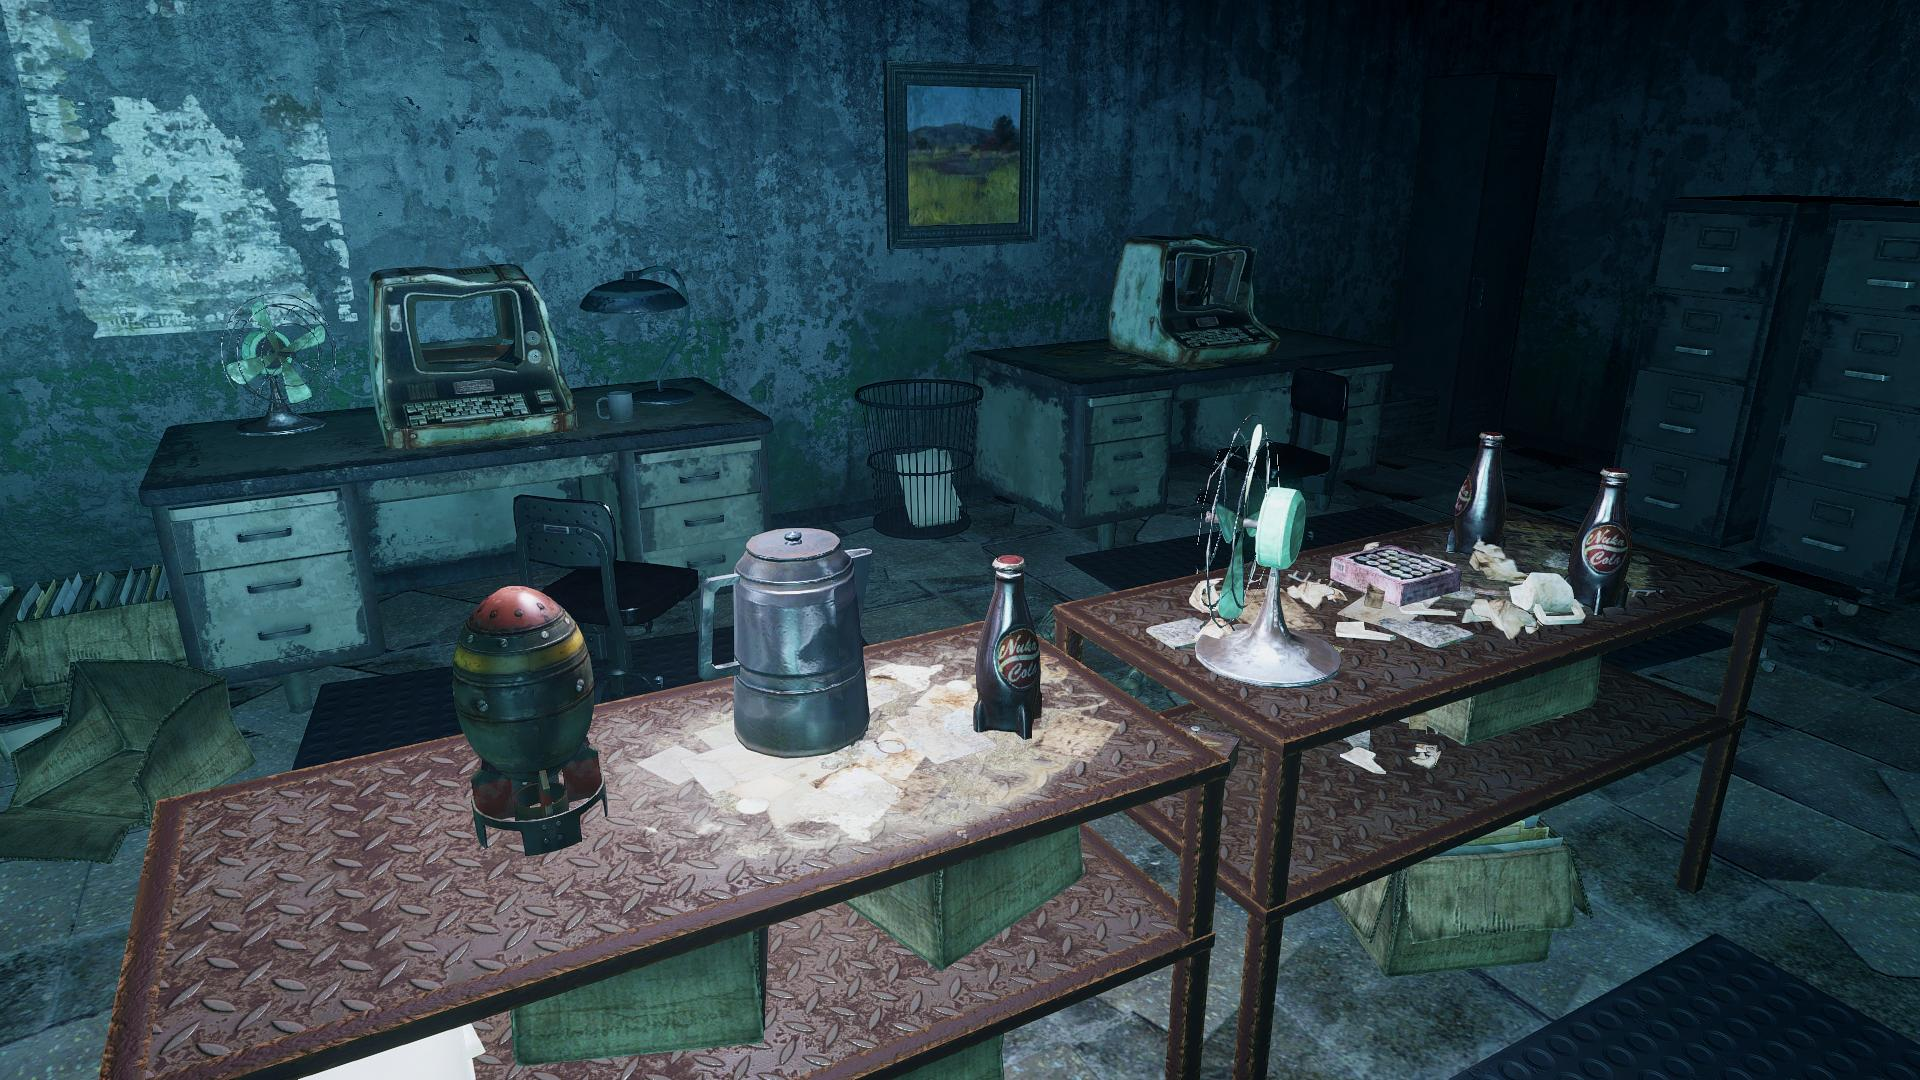 000311.Jpg - Fallout 4